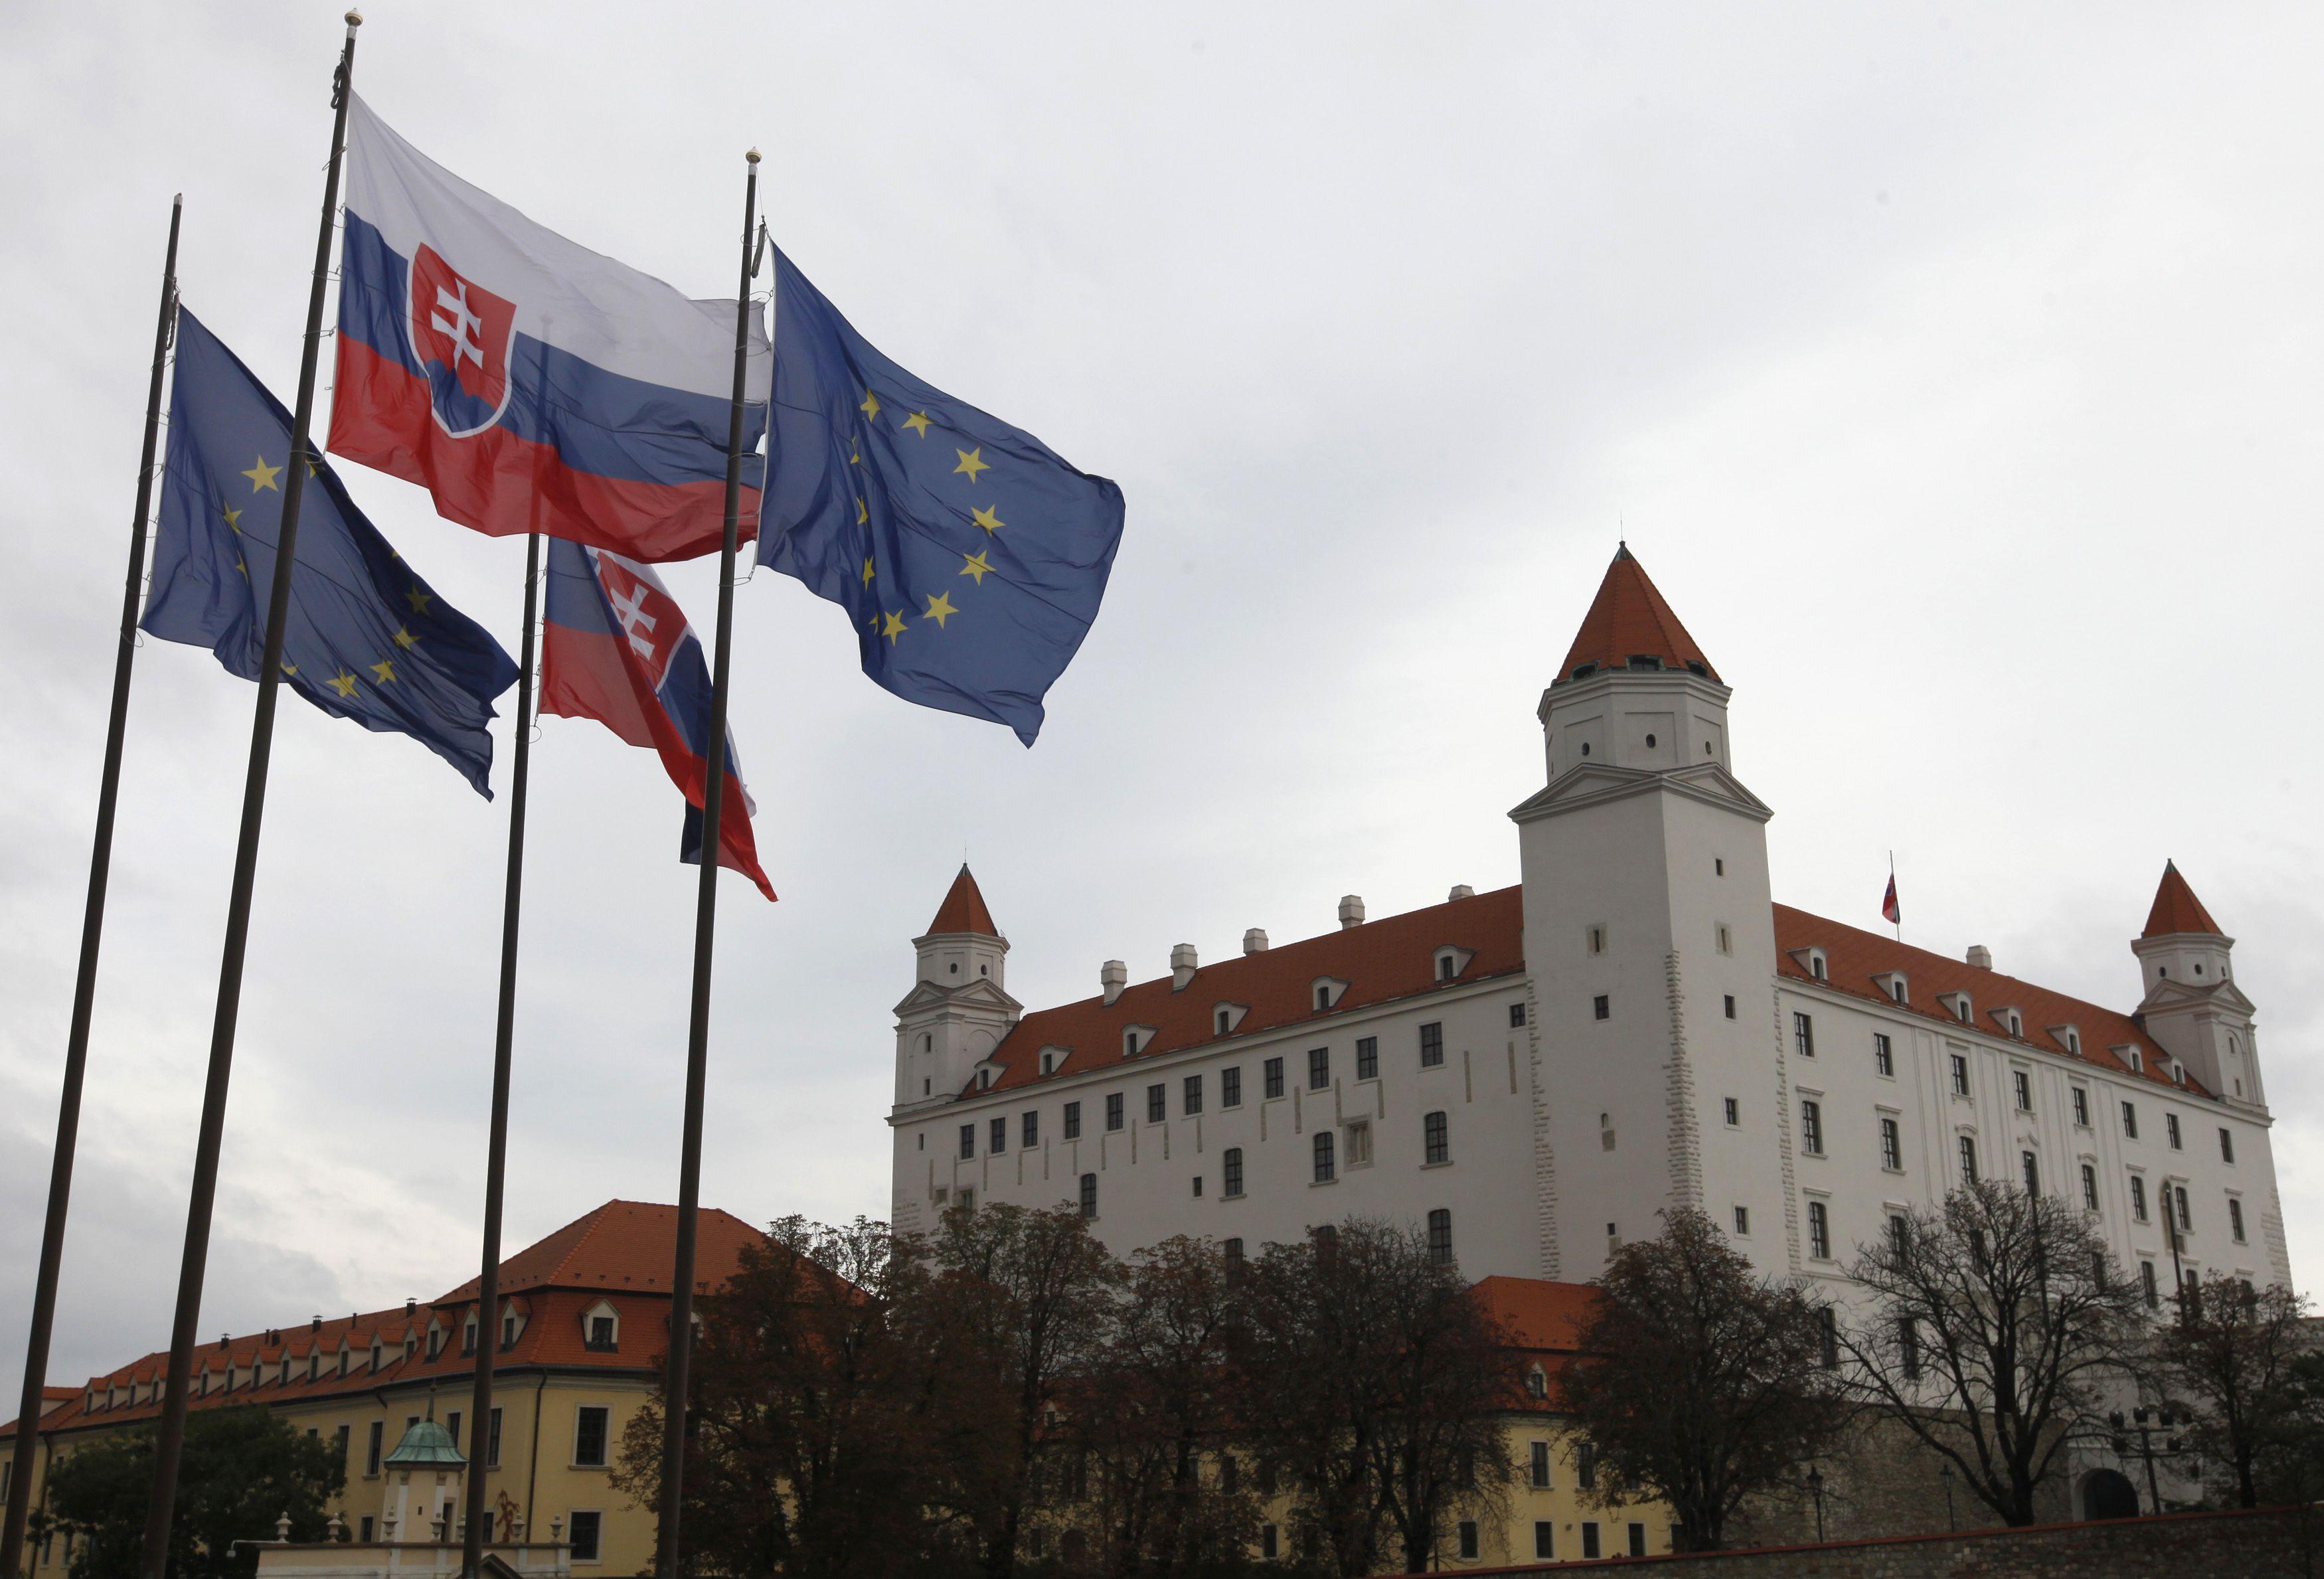 Šviesi ES ekonomikos teritorija: Vidurio Europa